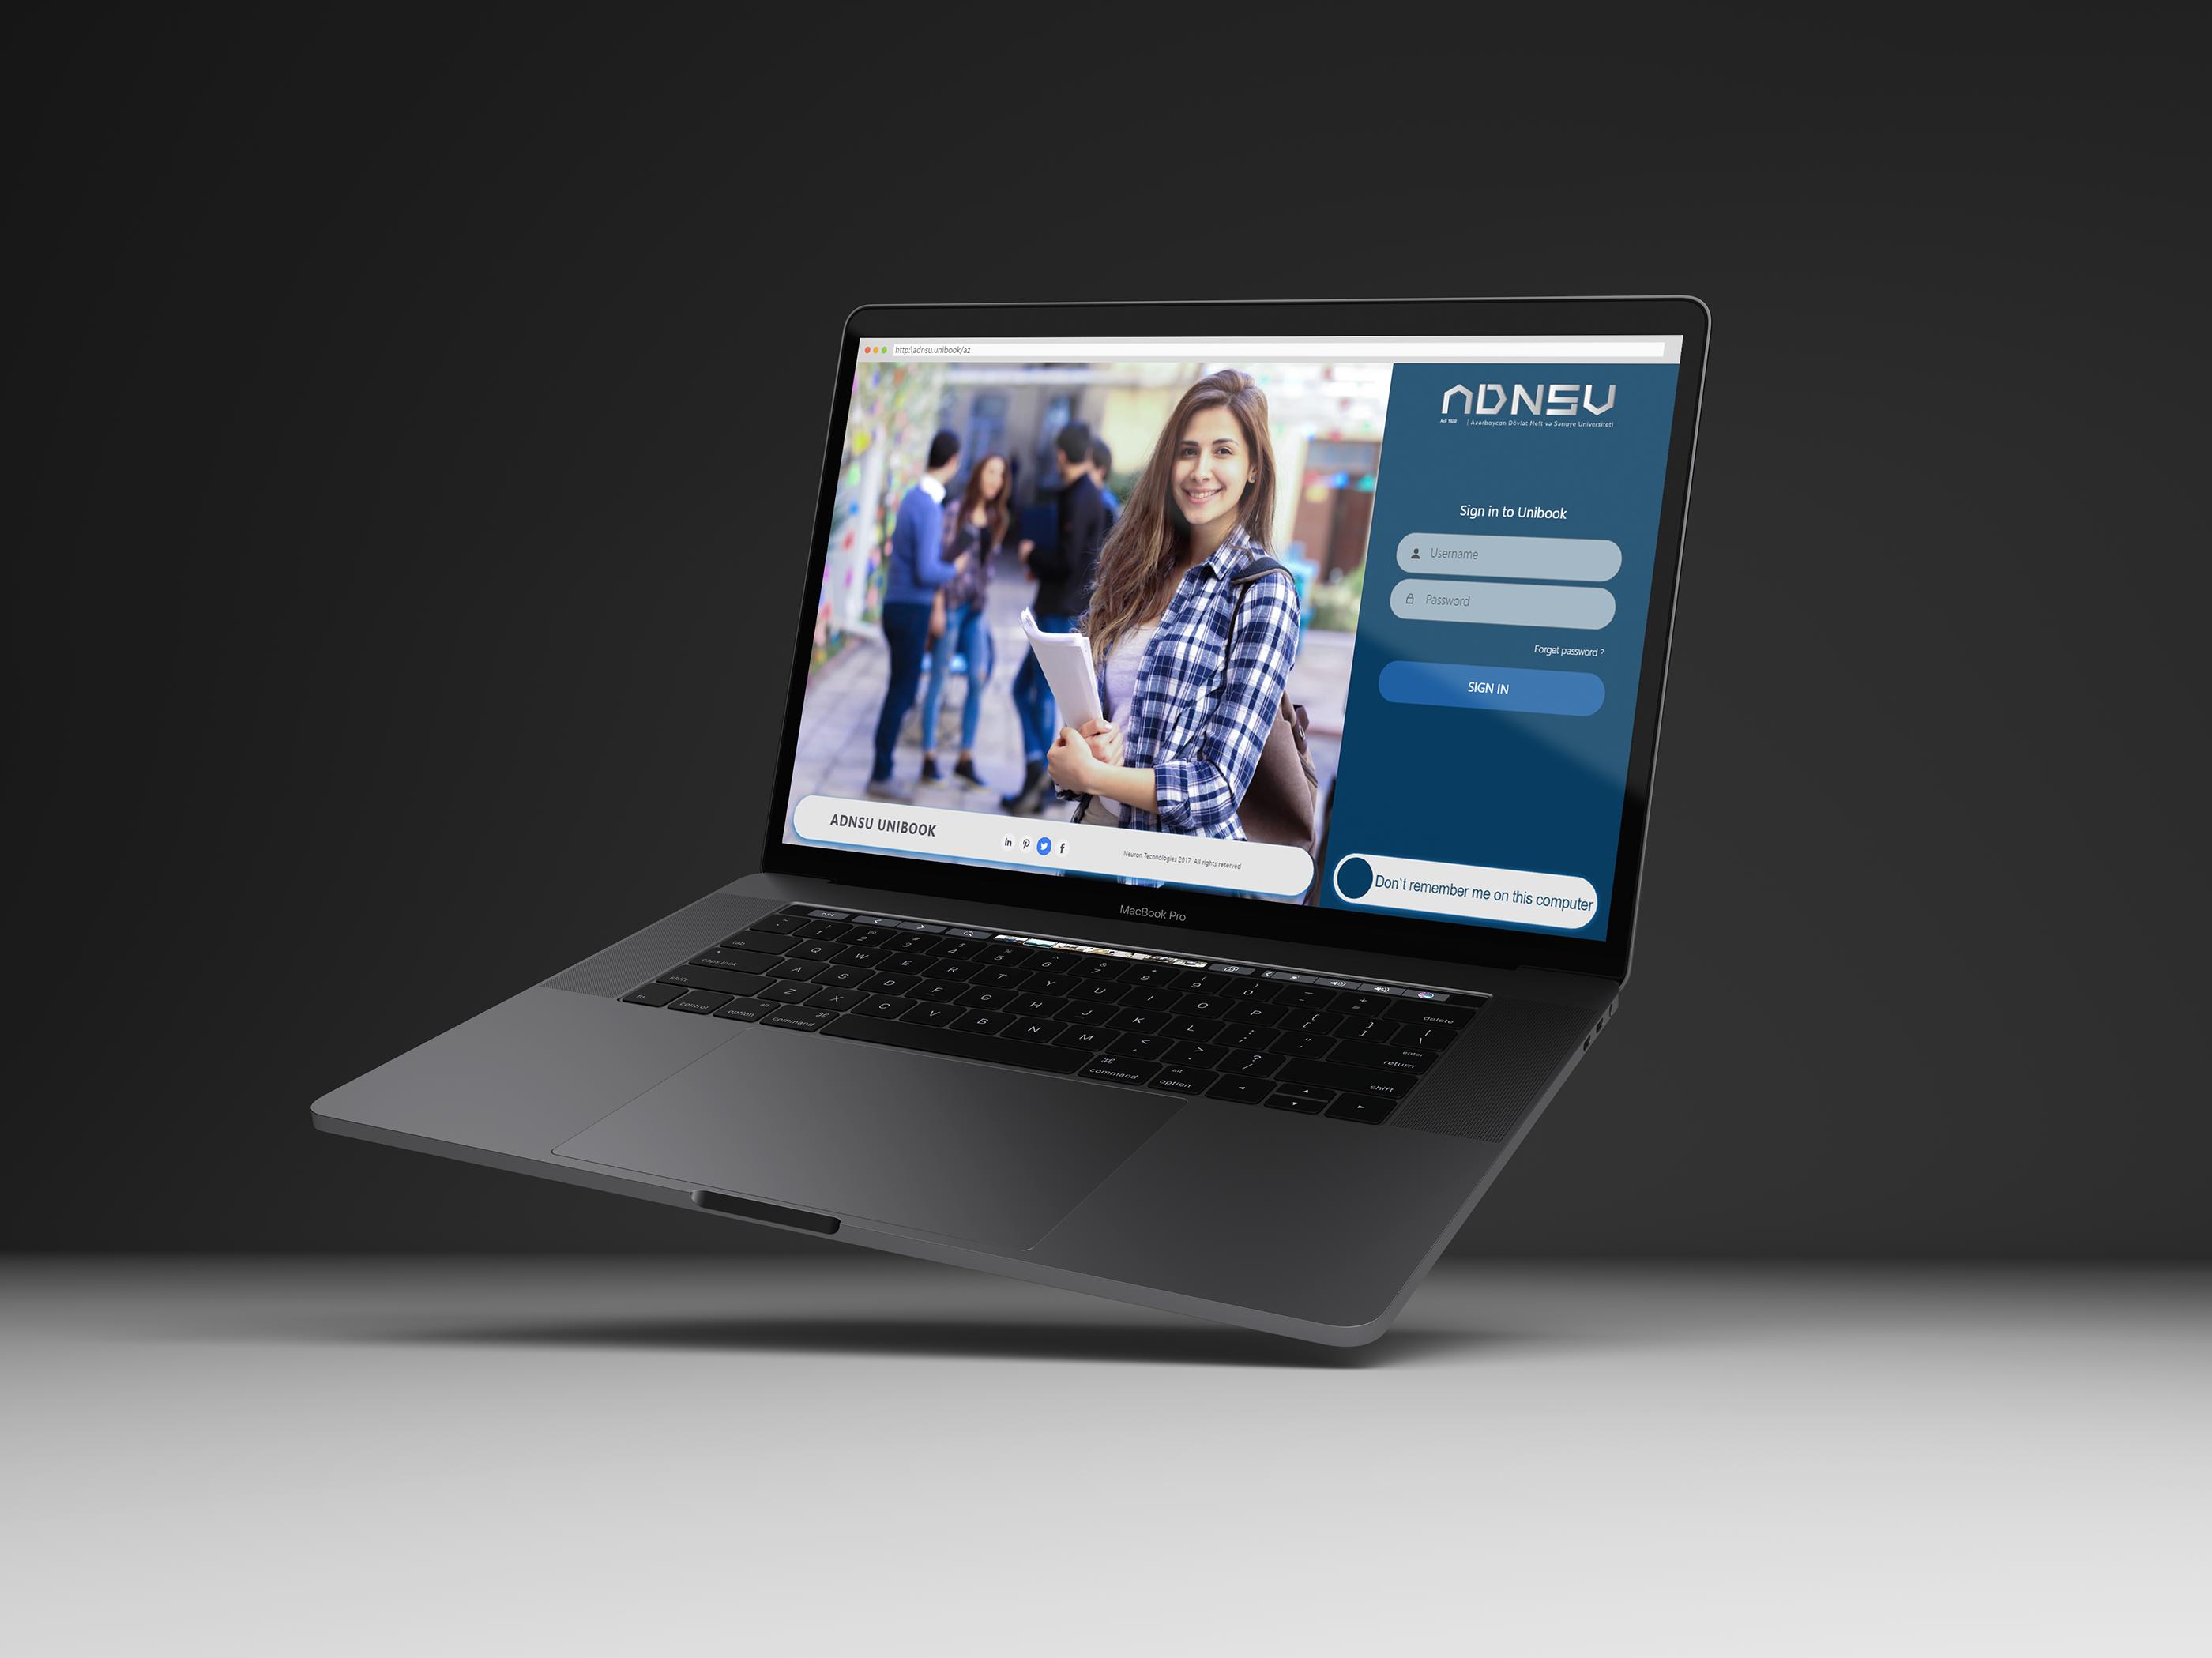 Asoiu Unibook Design Design Creative Professional Electronic Products